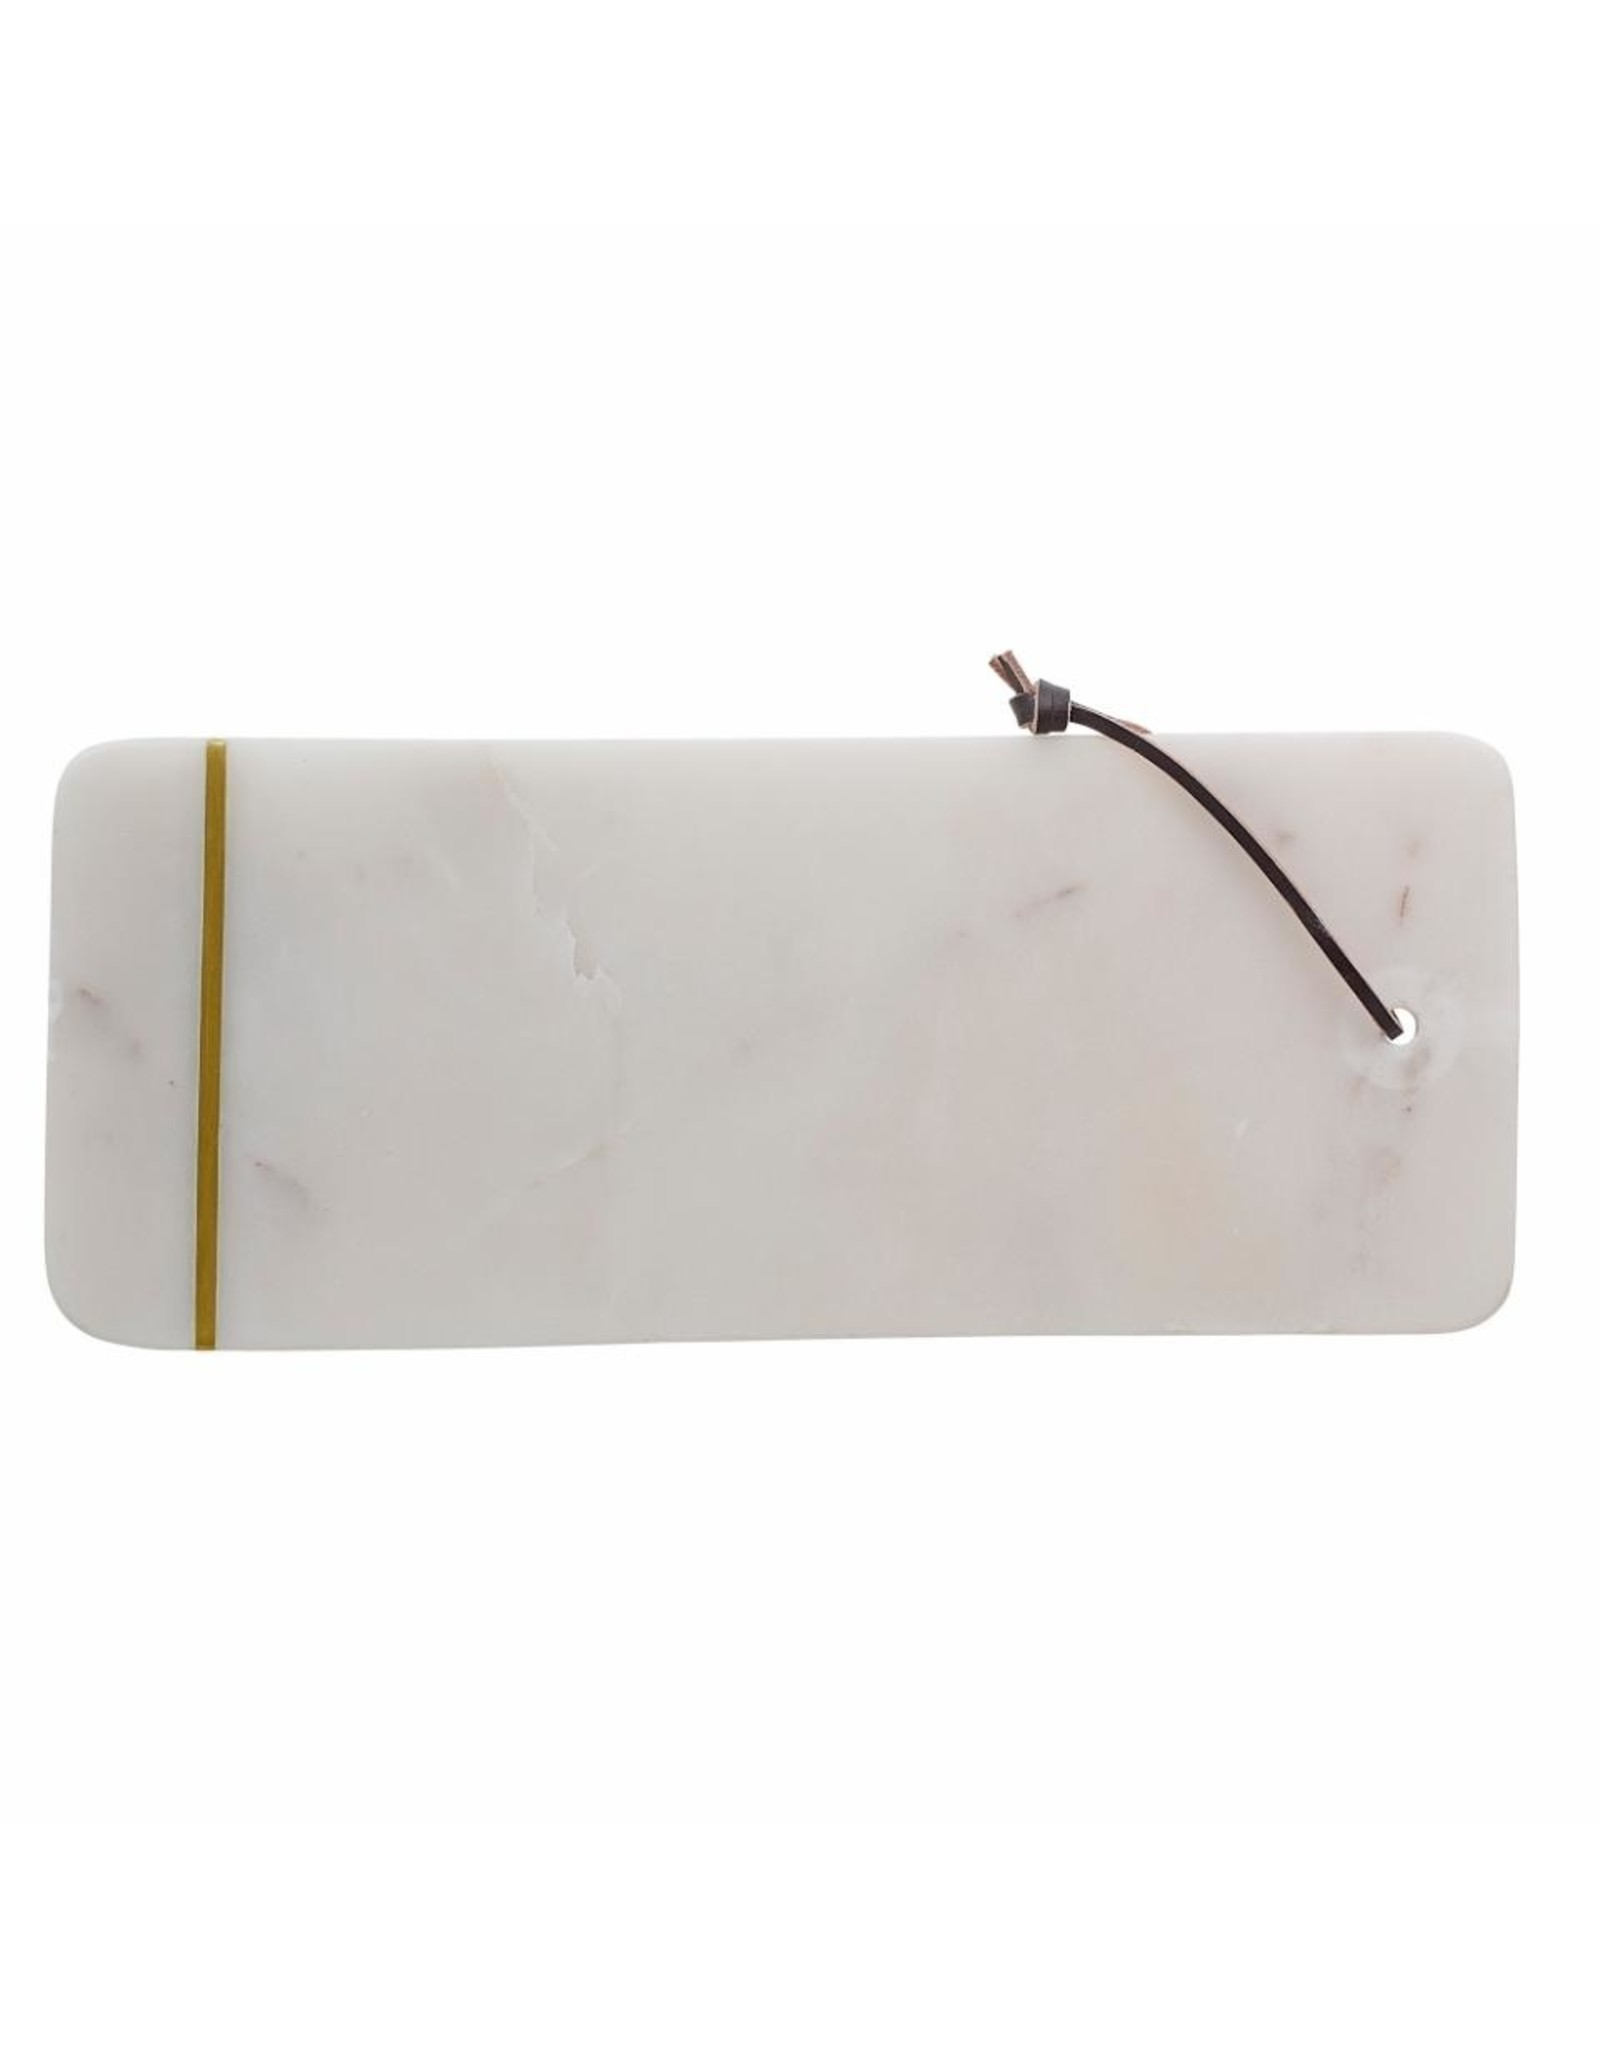 Marmeren plank wit